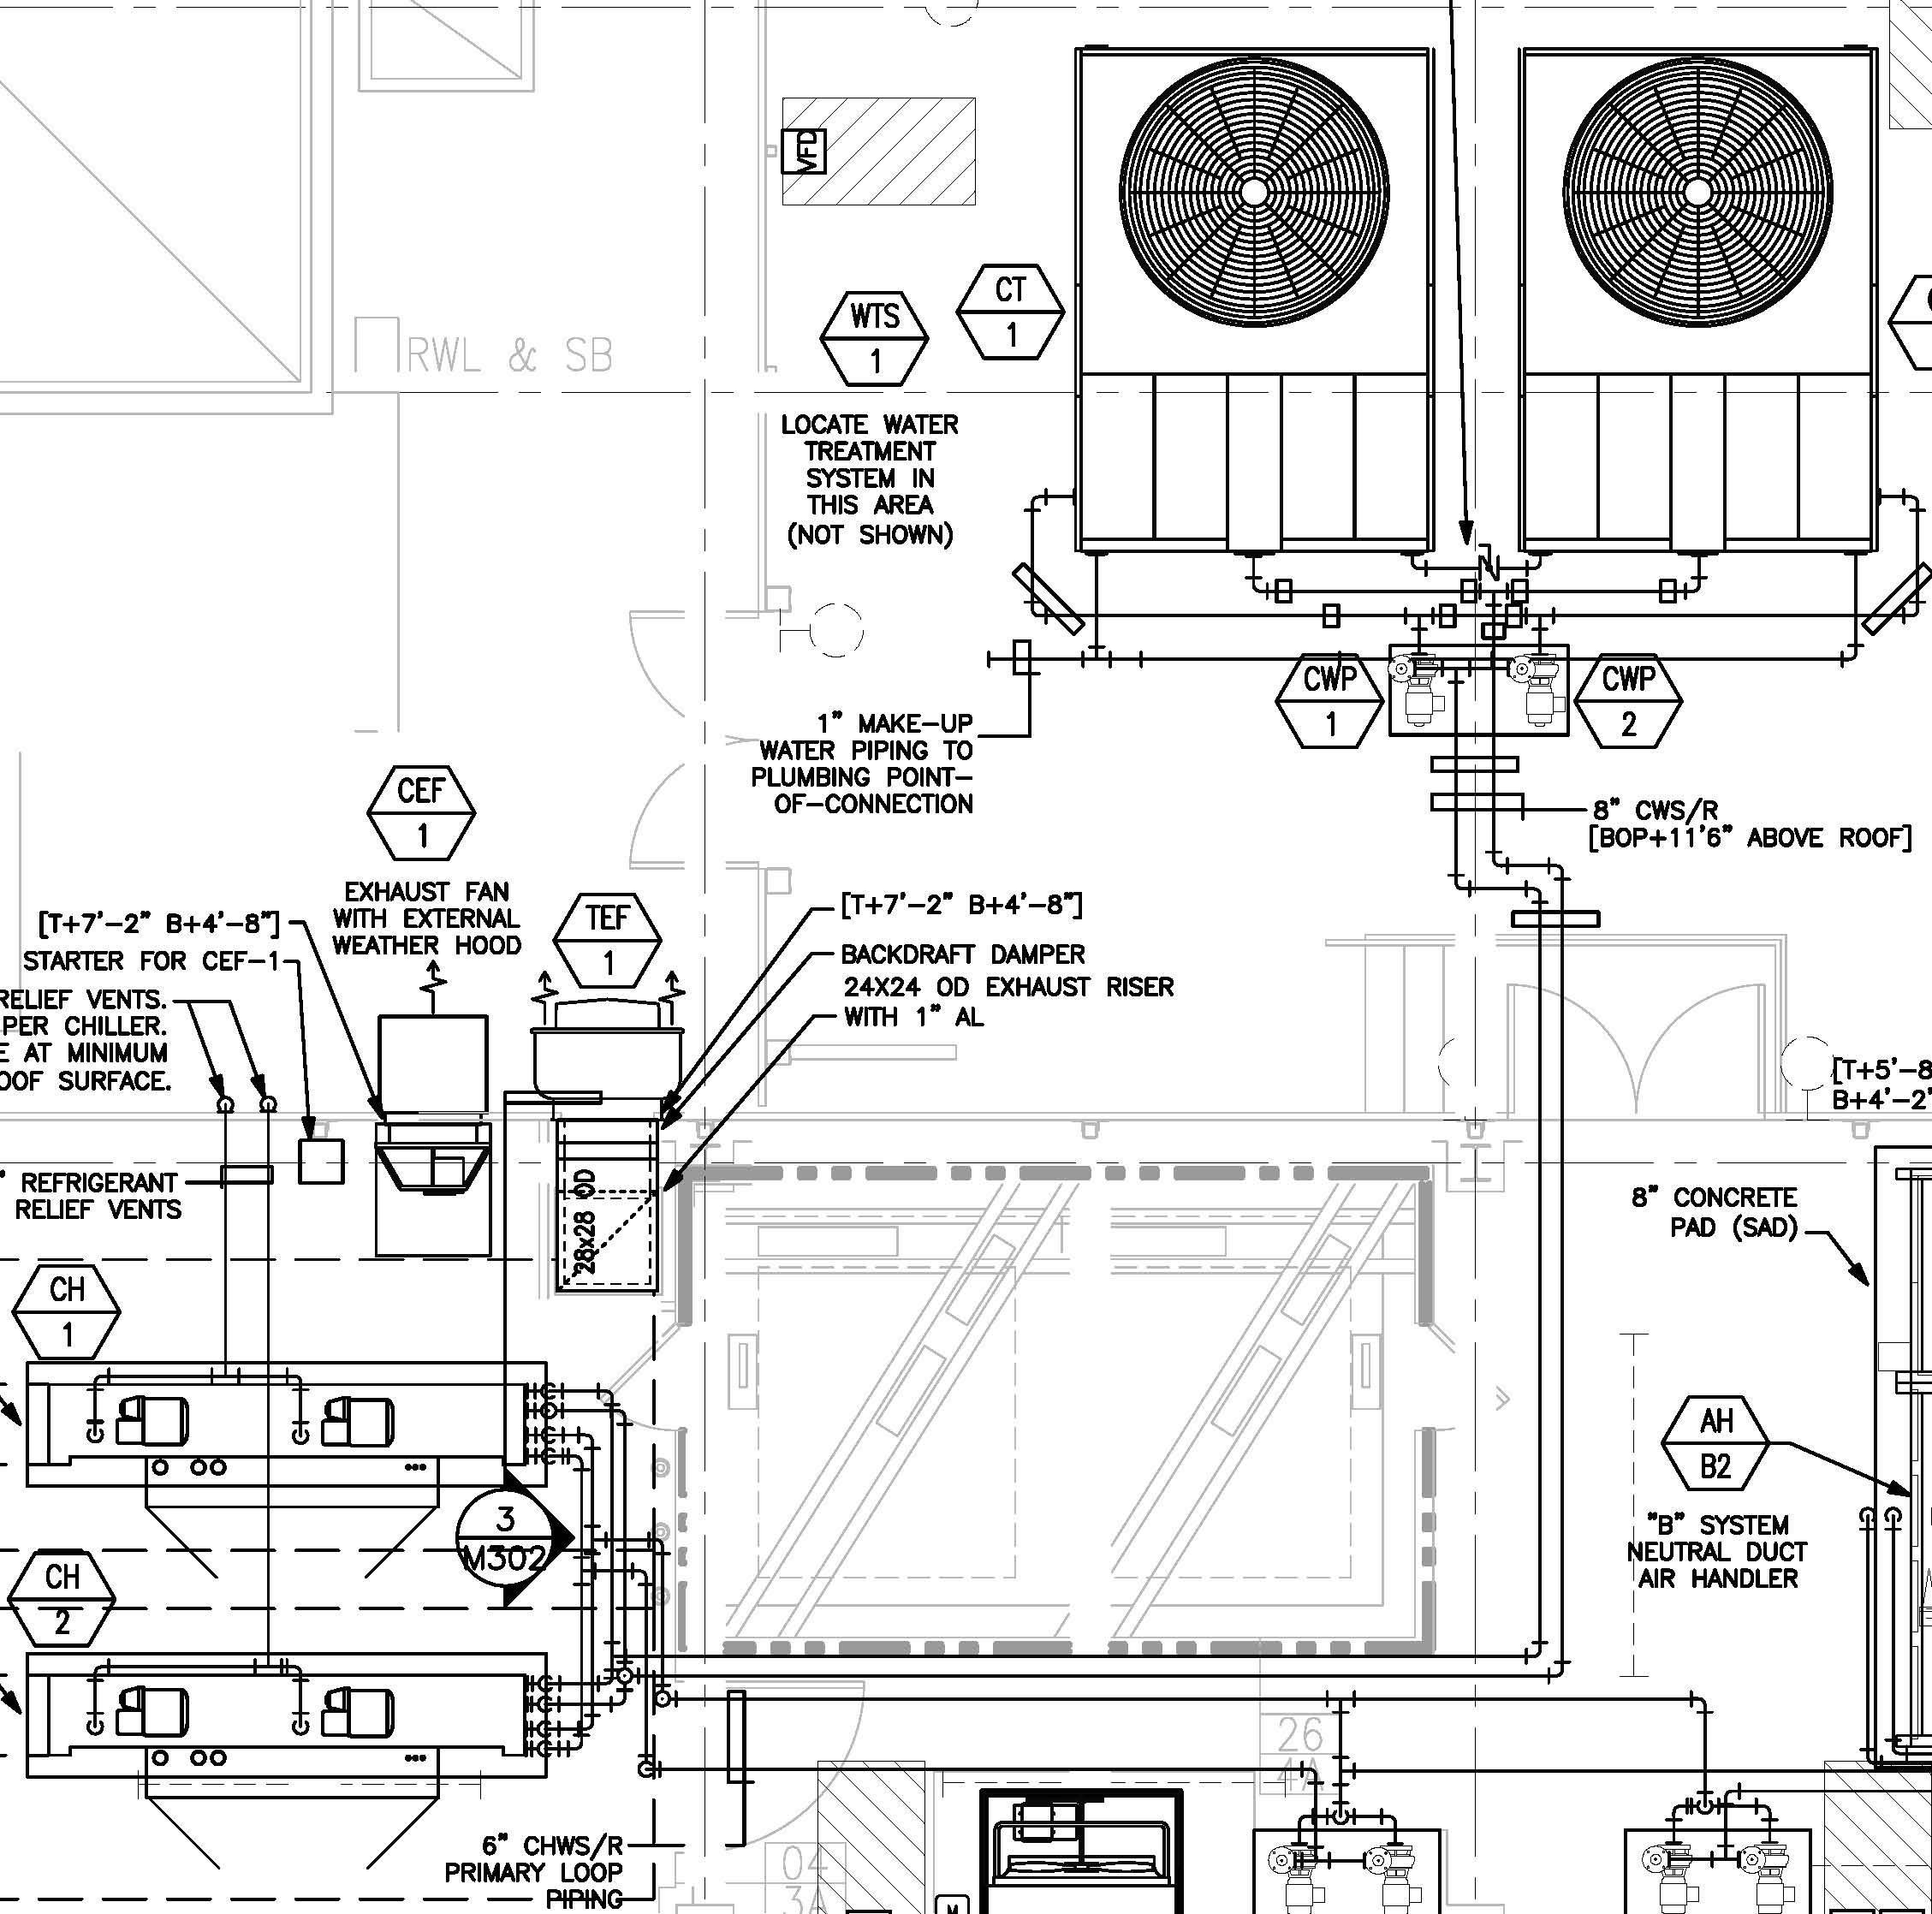 Freightliner Air System Diagram Turtle top Wiring Diagram Electrical Wiring Diagrams Of Freightliner Air System Diagram